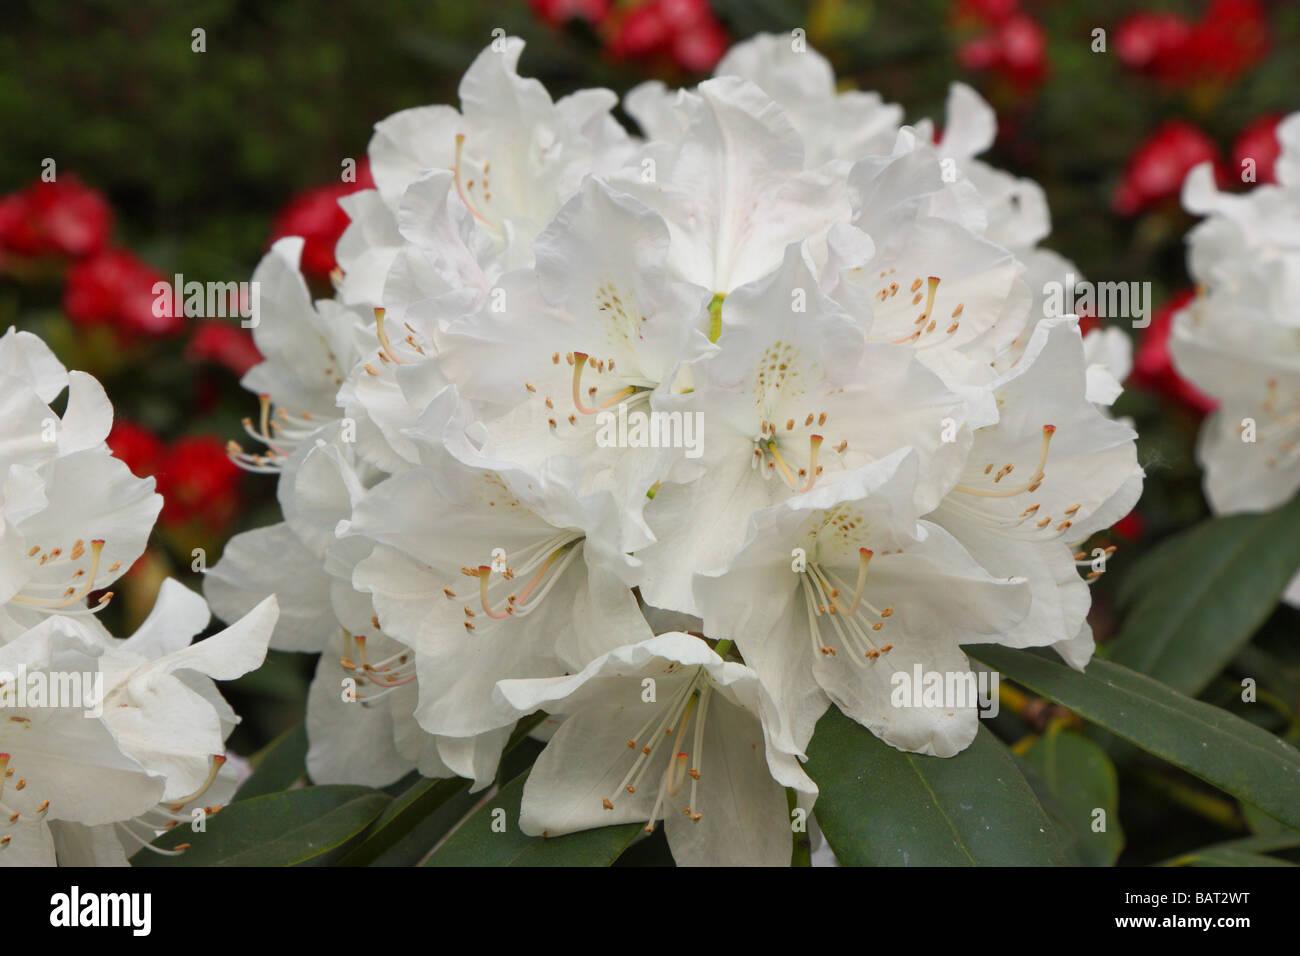 White Rhododendron Flower Stock Photos White Rhododendron Flower